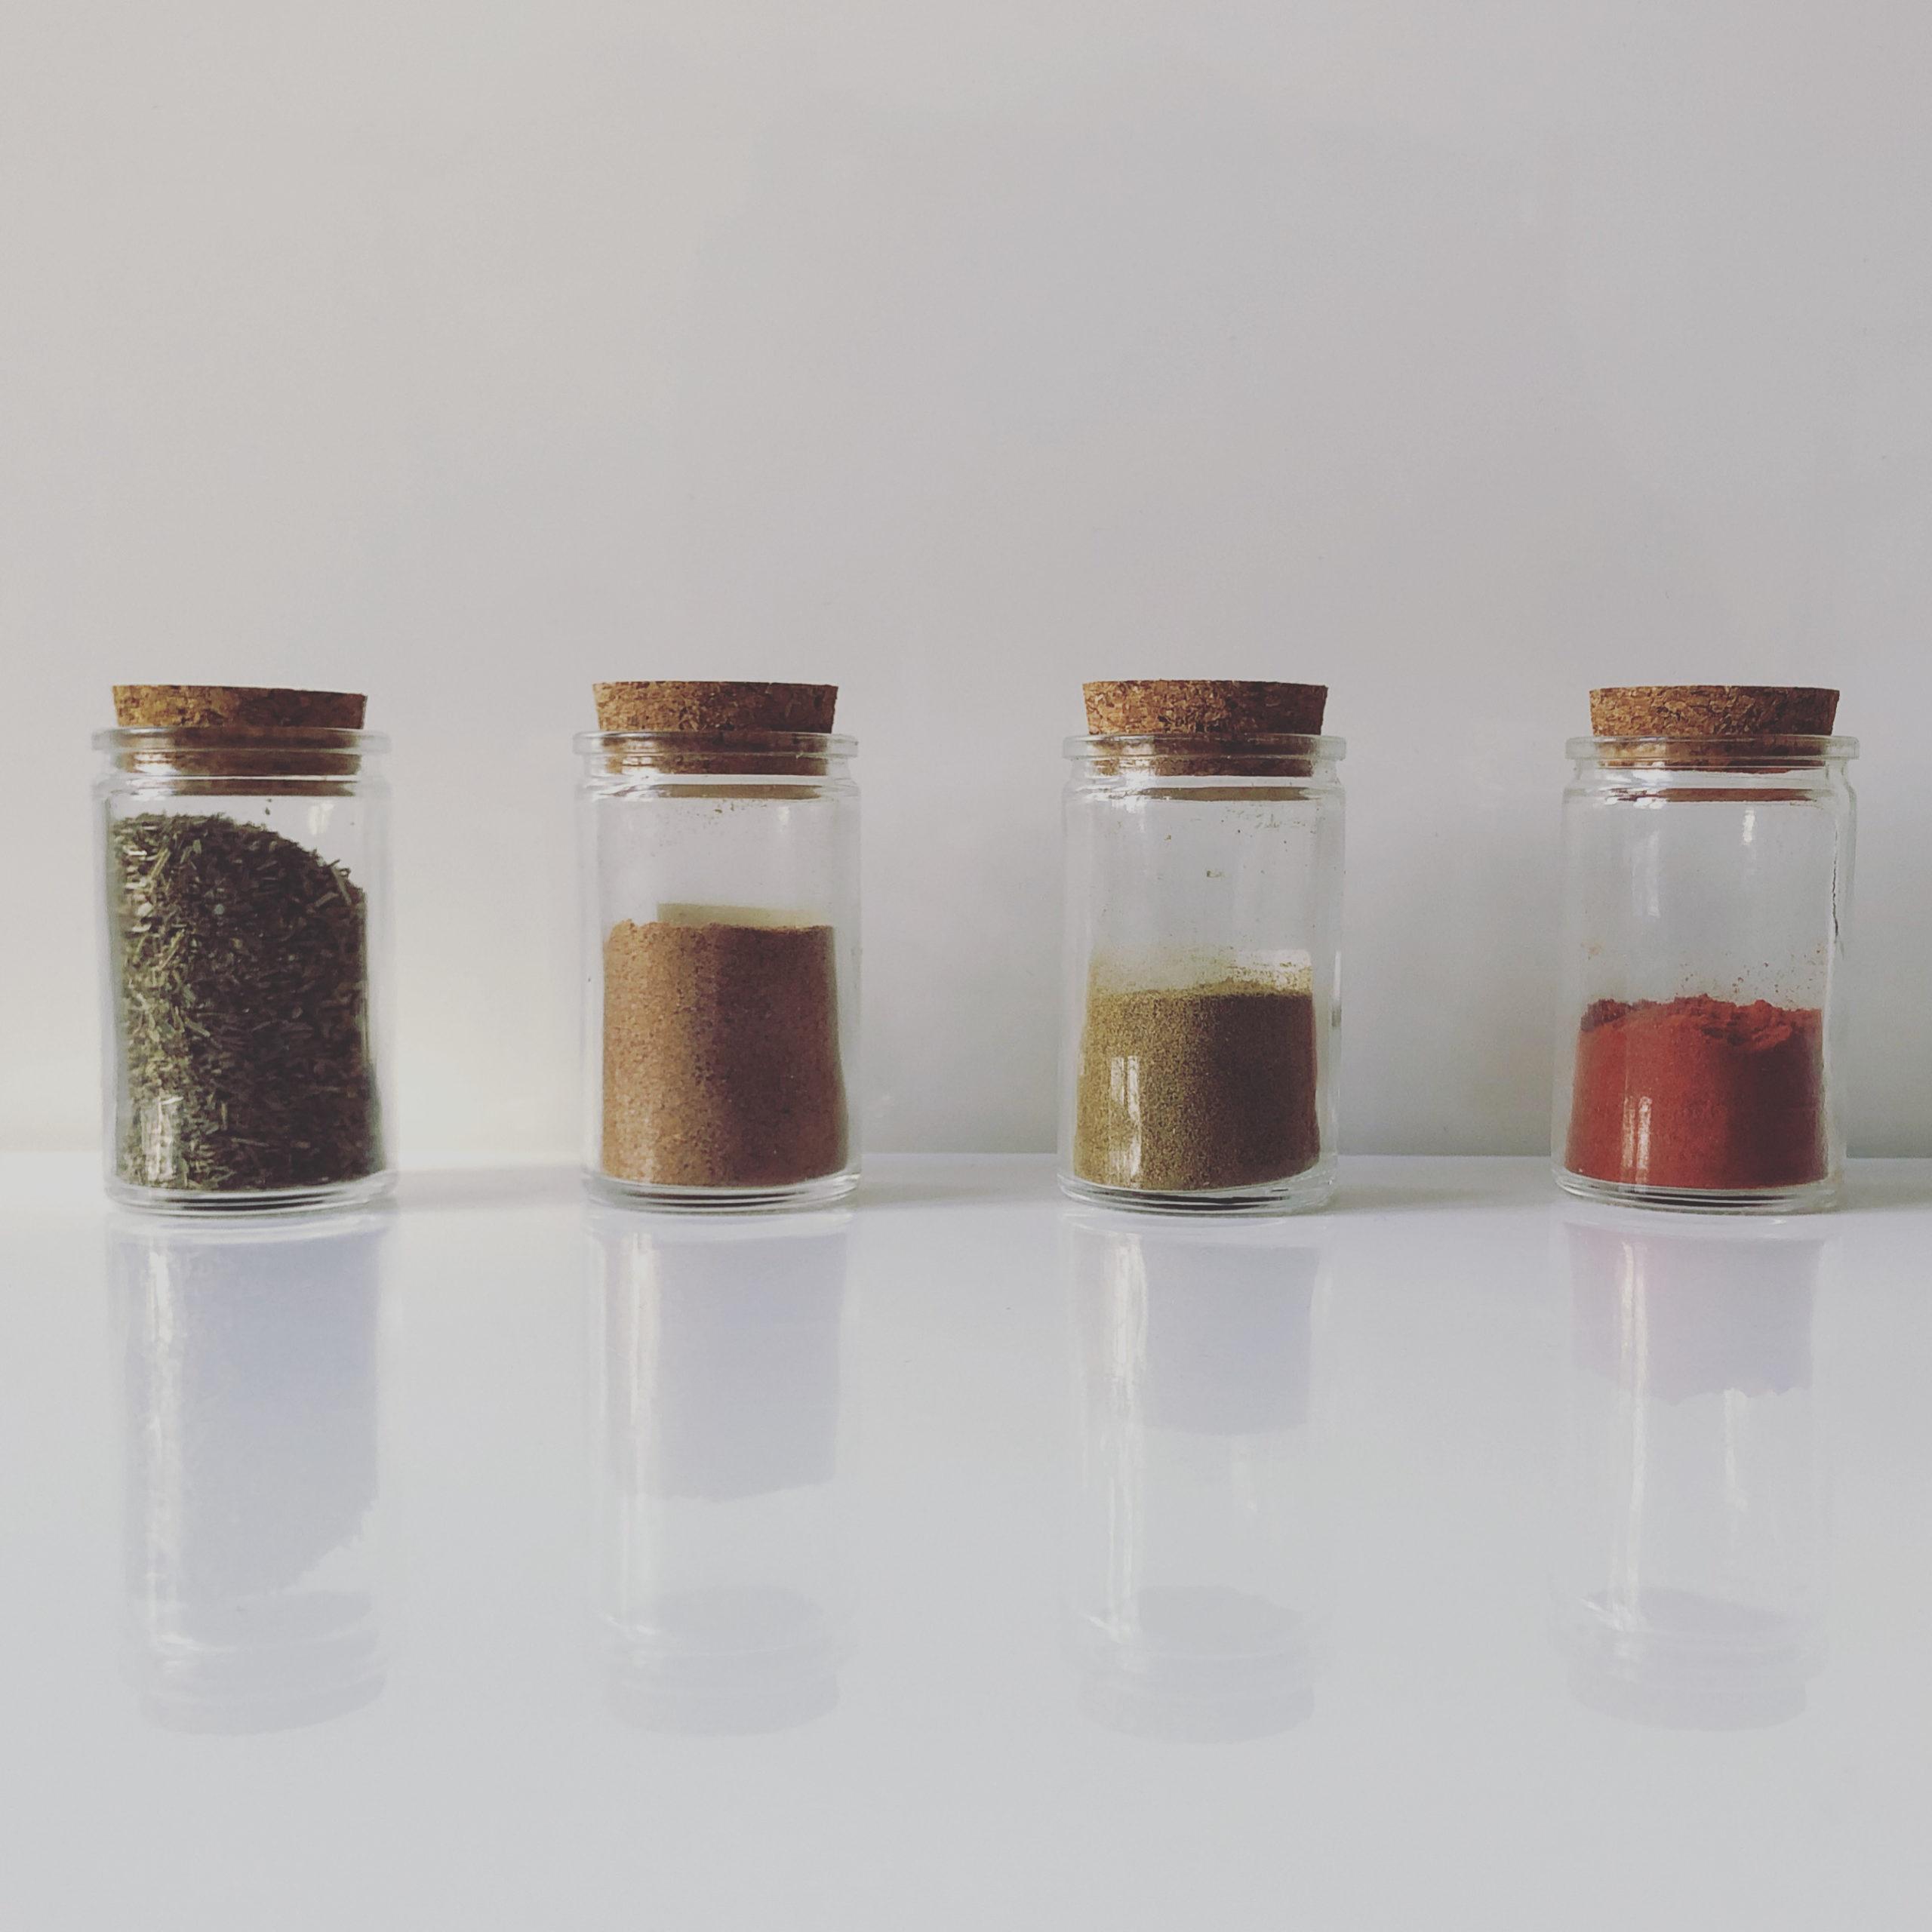 Organisation des épices